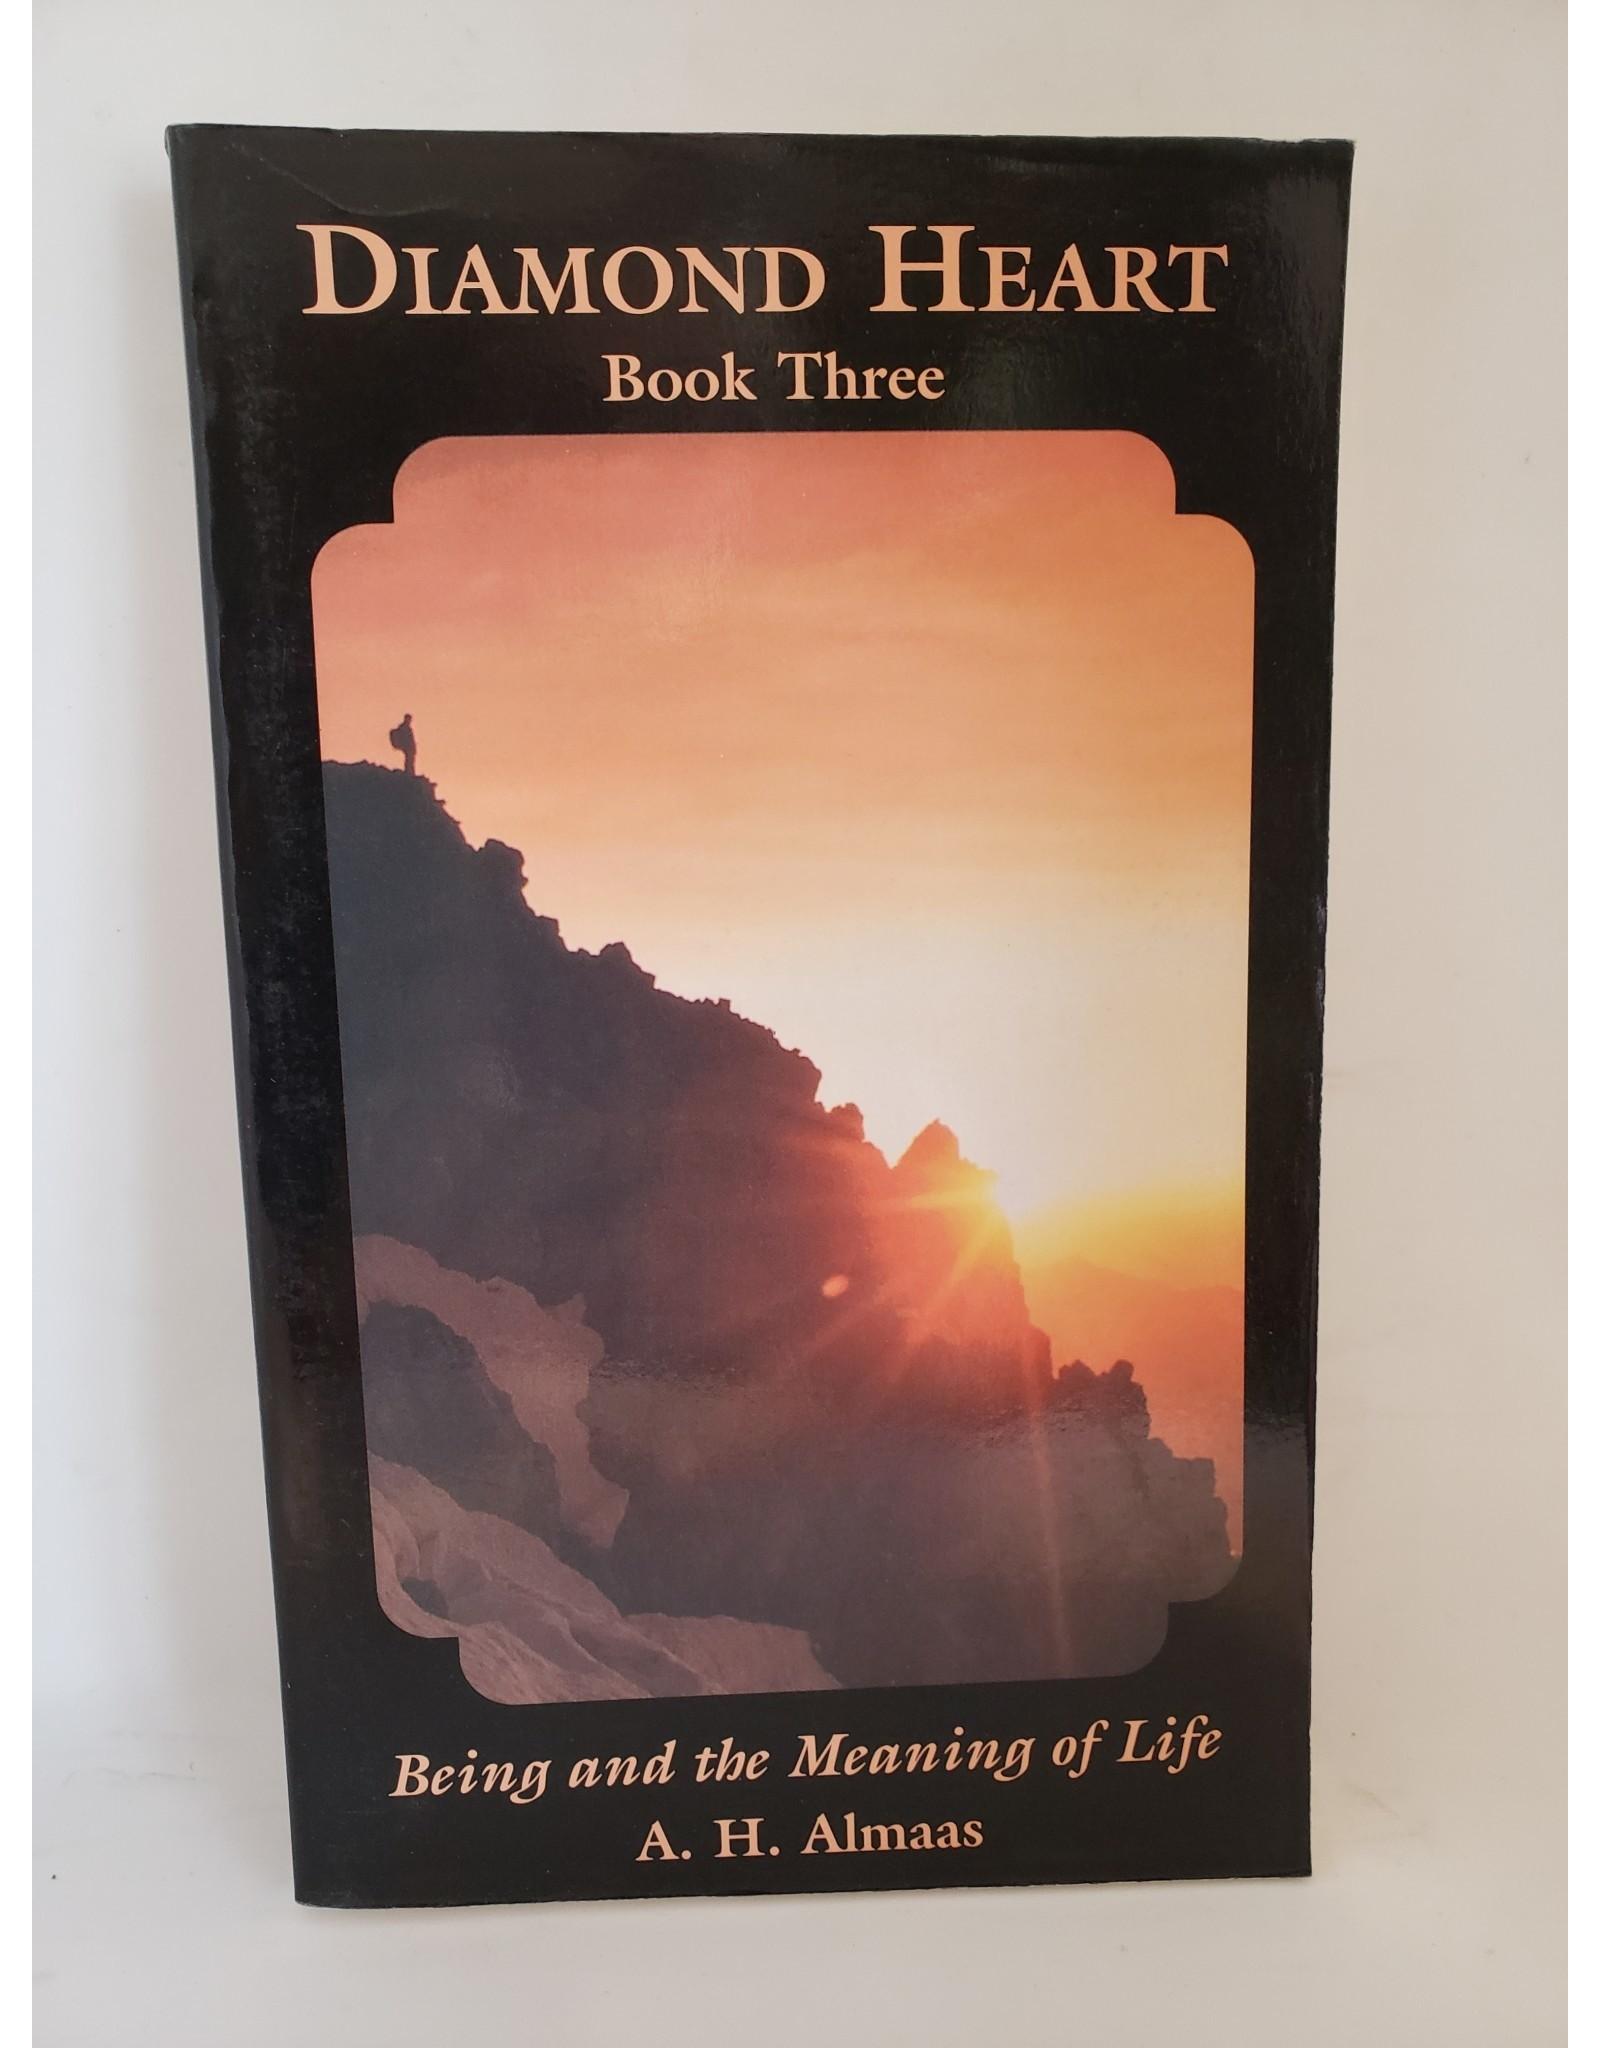 Diamond Heart Book Three